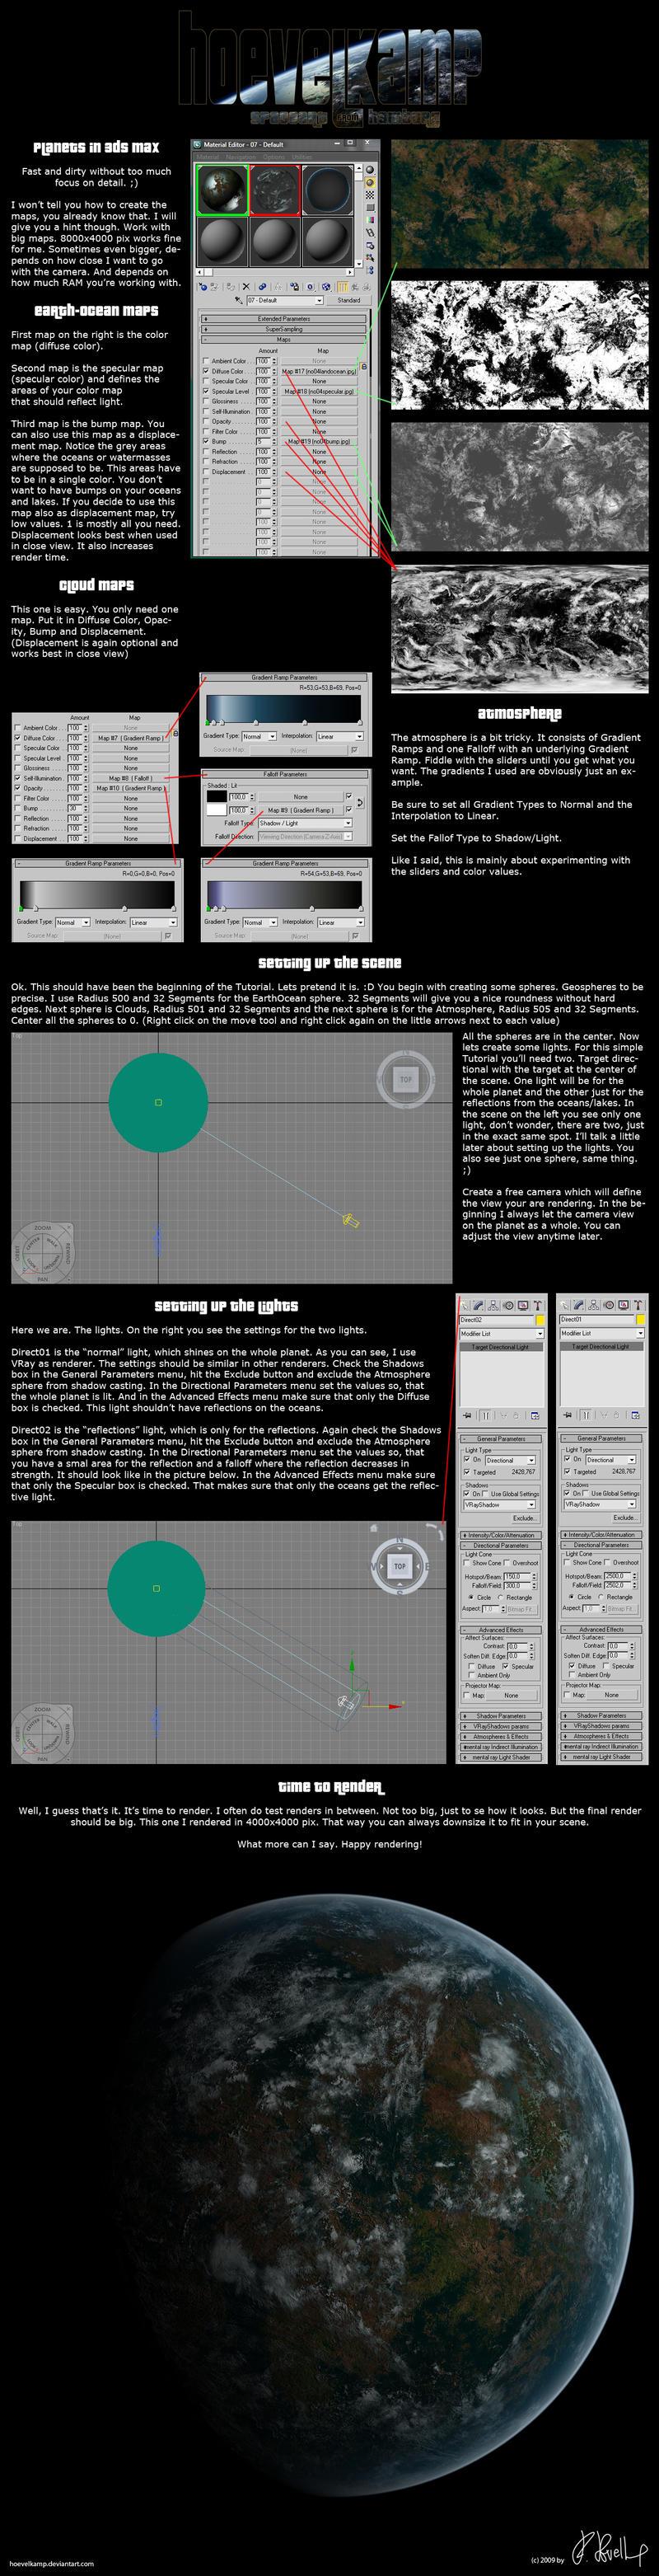 3ds max planet tutorial by hoevelkamp on deviantart for Tutorial 3d max